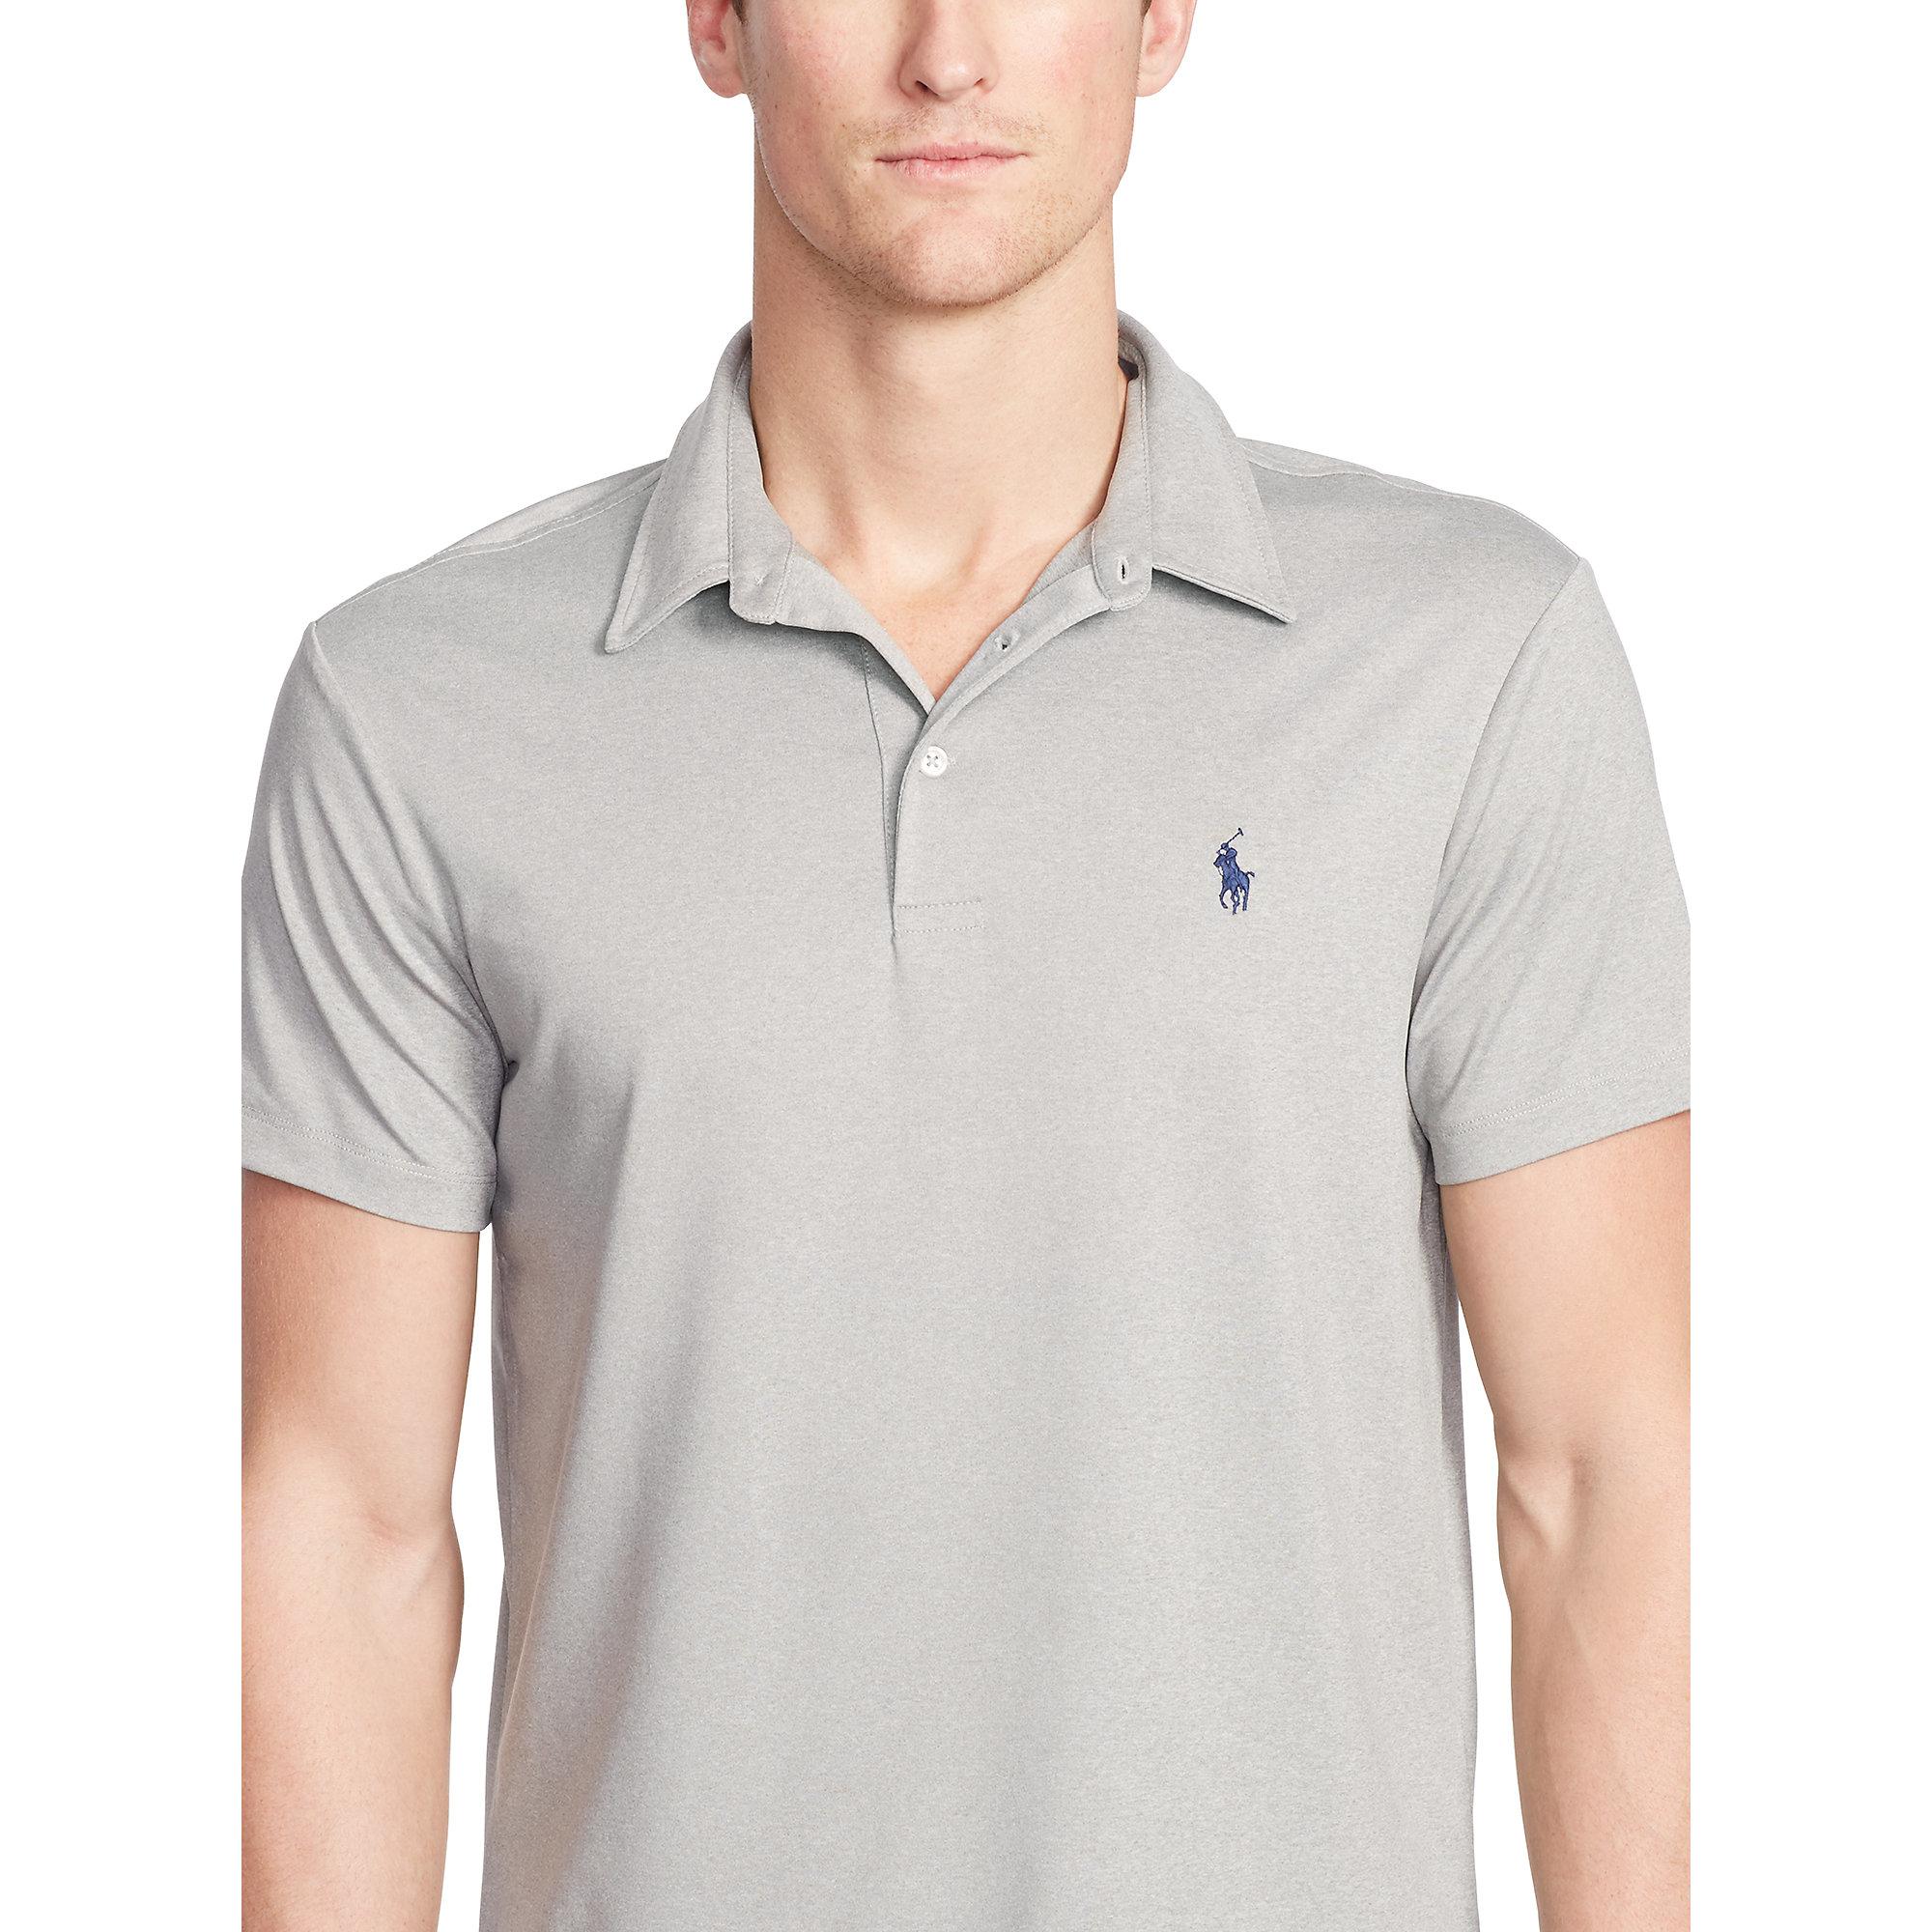 9f1676e30 Lyst - Polo Ralph Lauren Custom-fit Performance Polo in Gray for Men